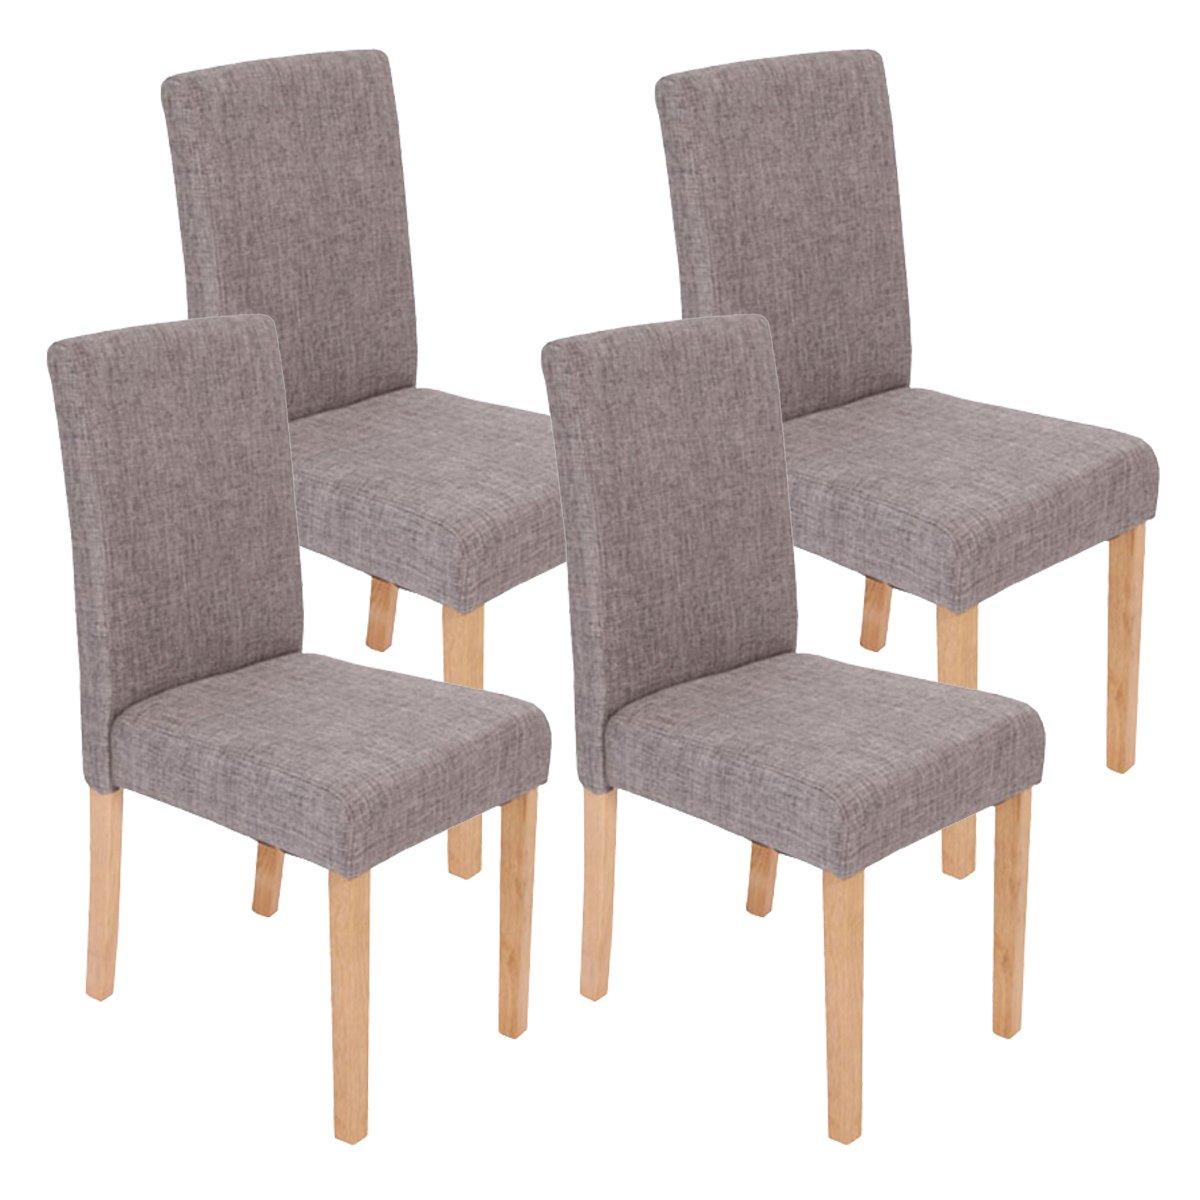 lote 4 sillas de comedor litau tela precioso dise o tela